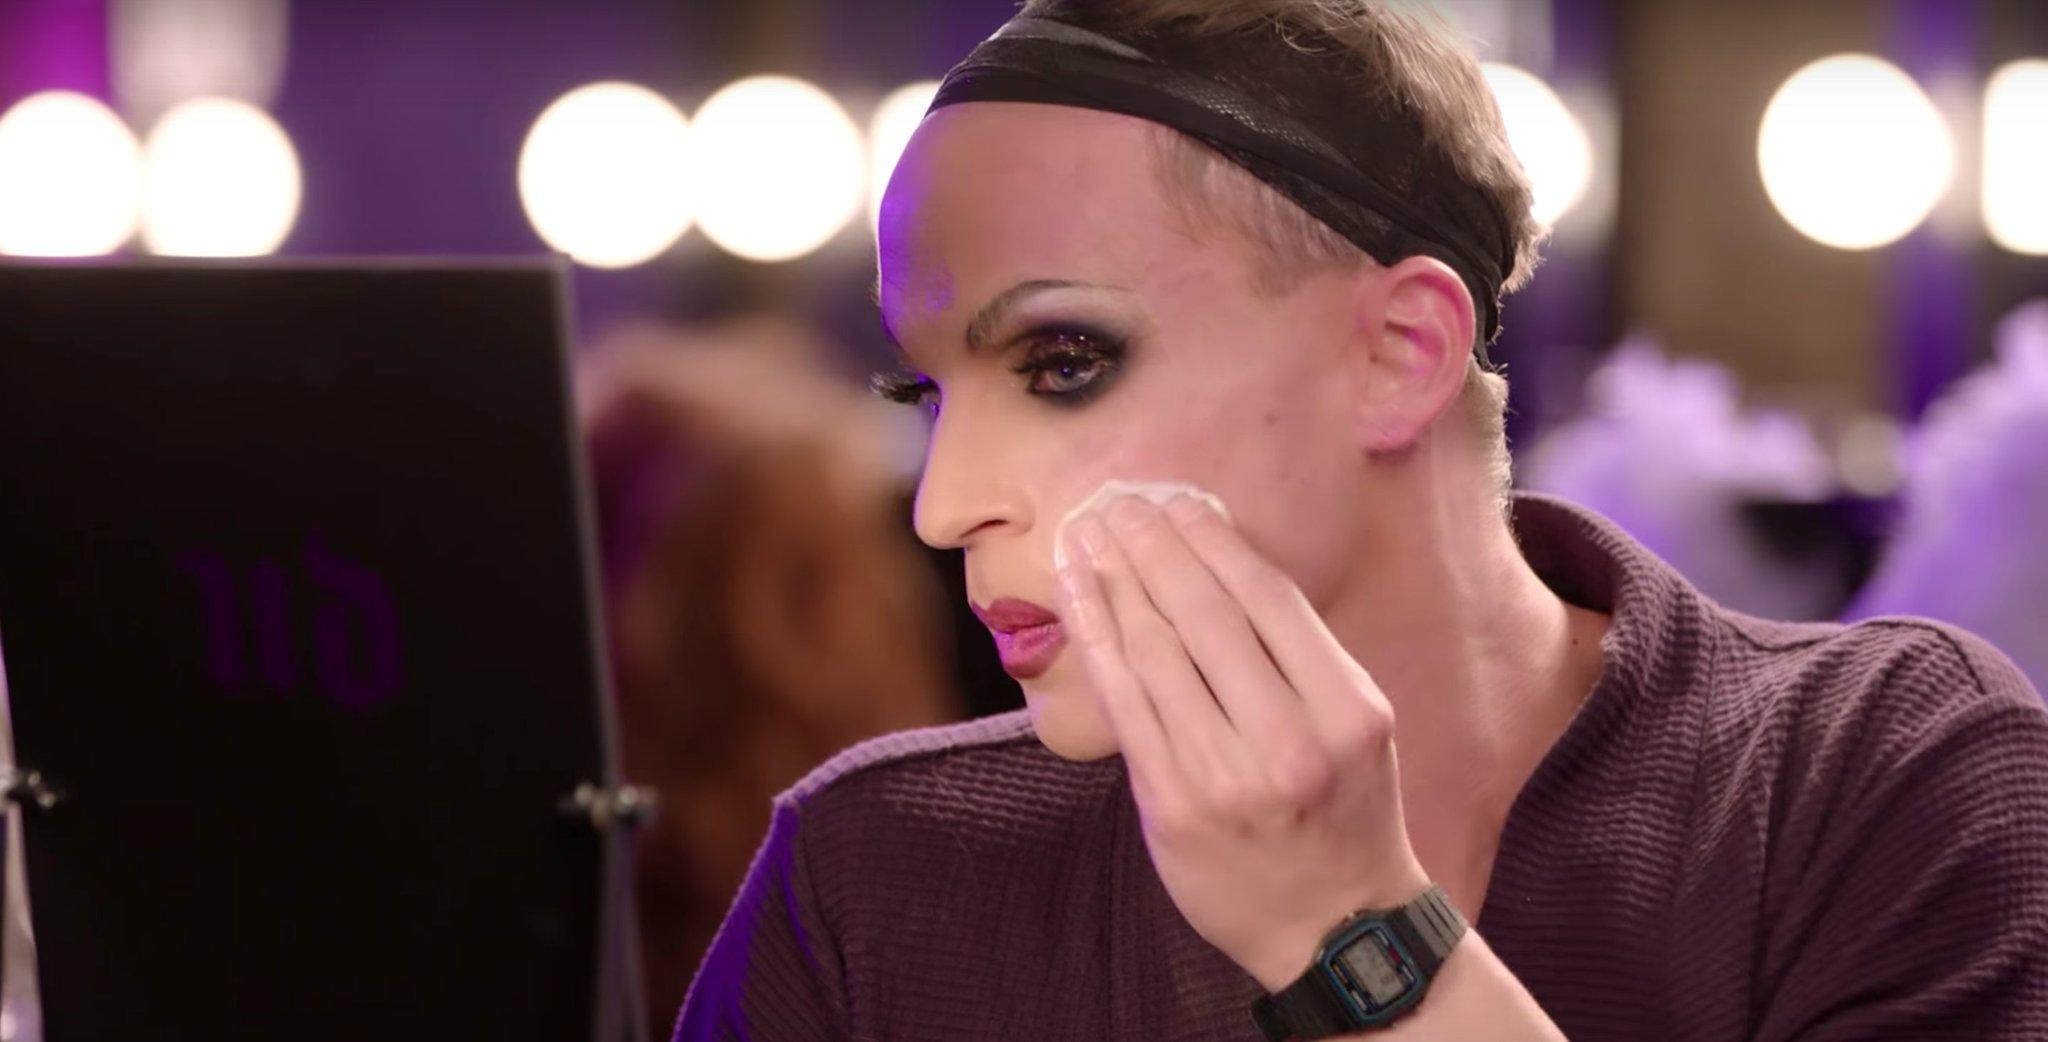 Watch Drag Queens Test the Urban Decay Meltdown Makeup Removers https://t.co/oFcIGktKcI https://t.co/vIp1SxDLdb